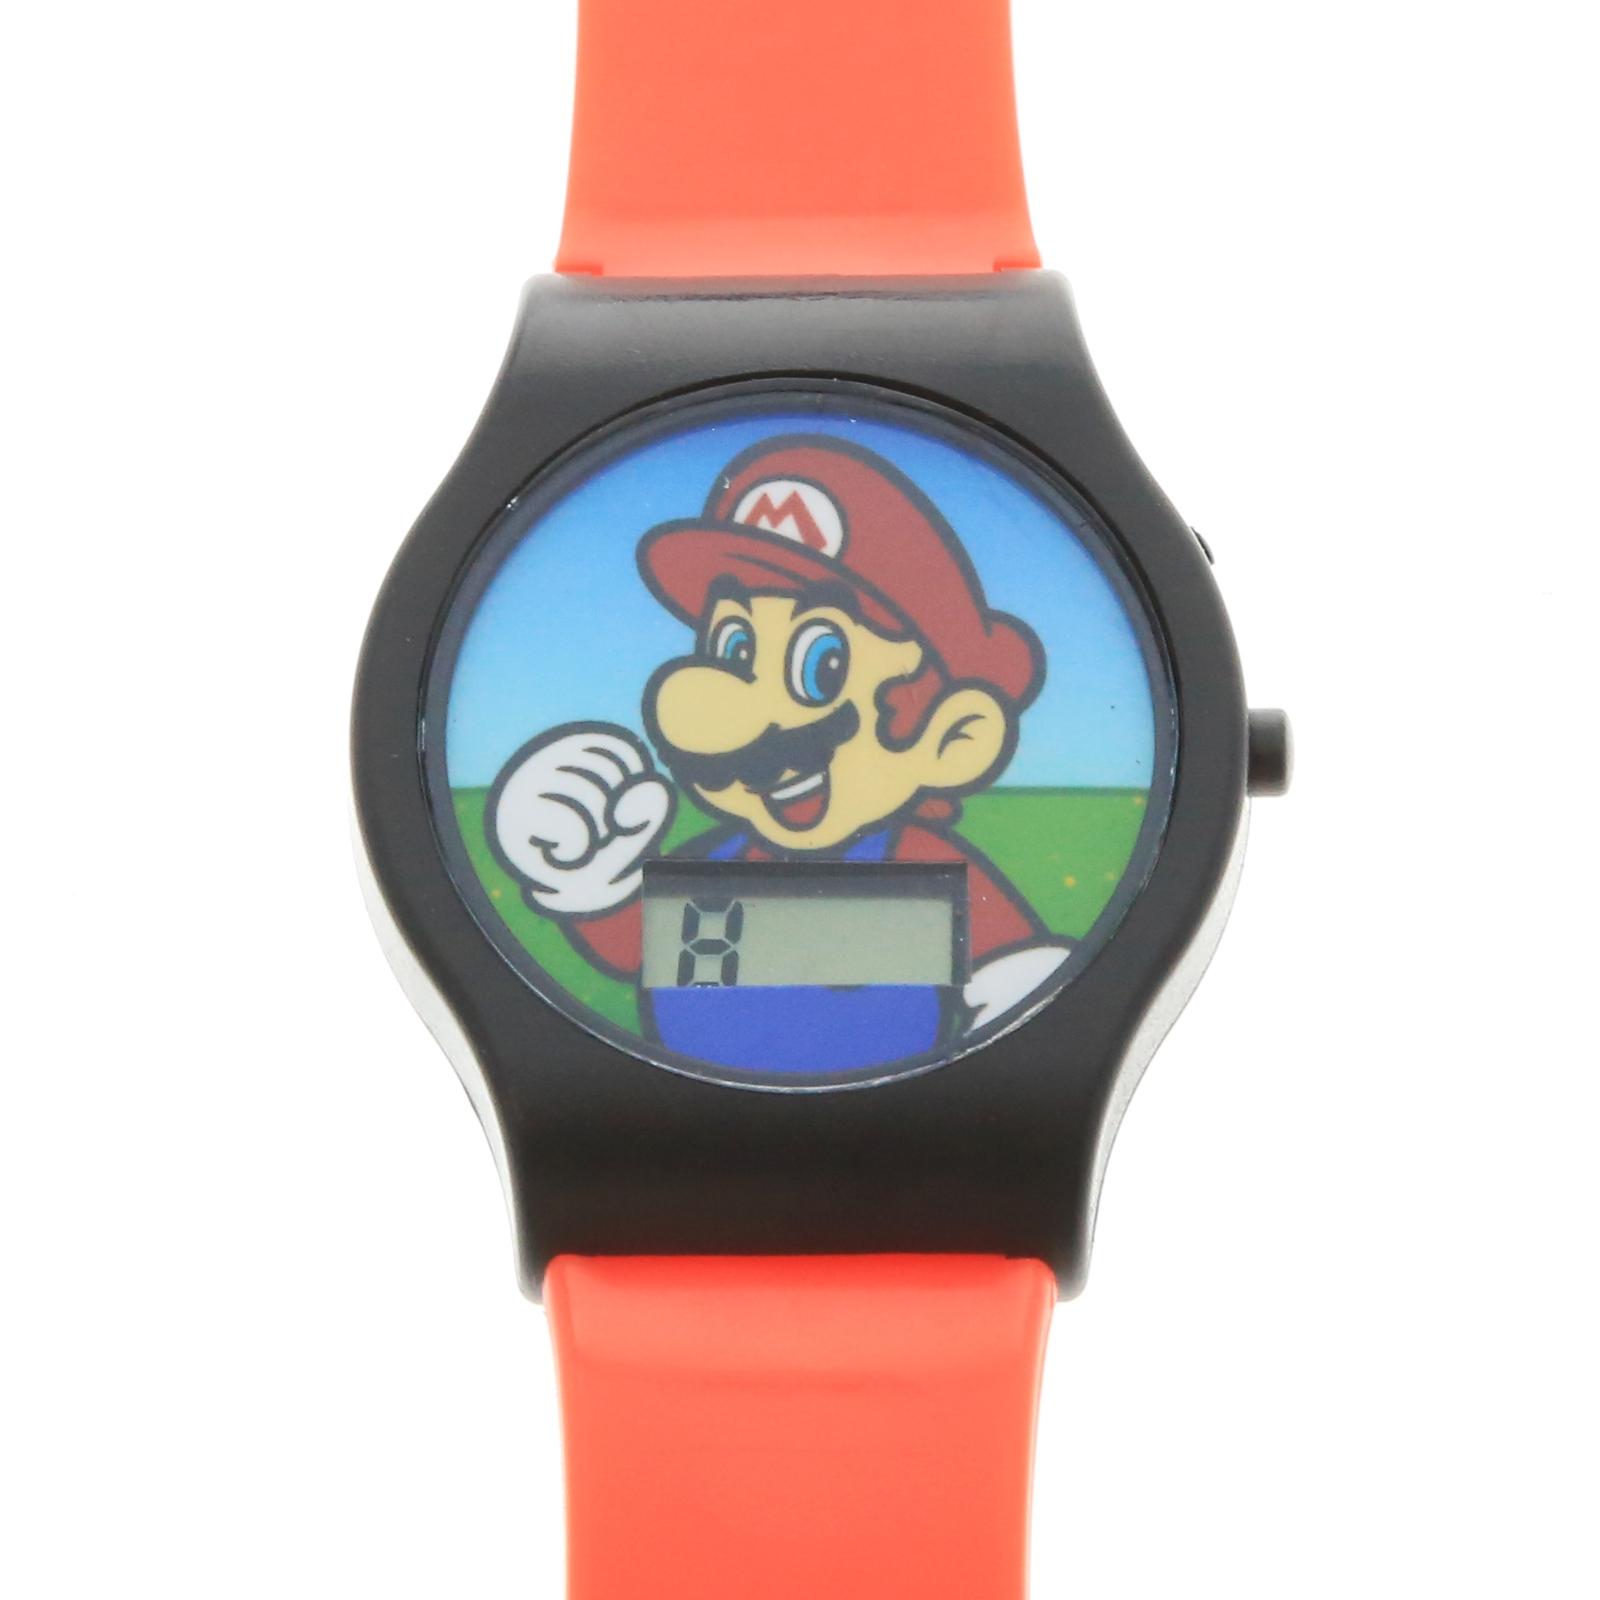 Nintendo Super Mario Boys LCD Wrist Watch Digital Style Adjustable Strap - Red